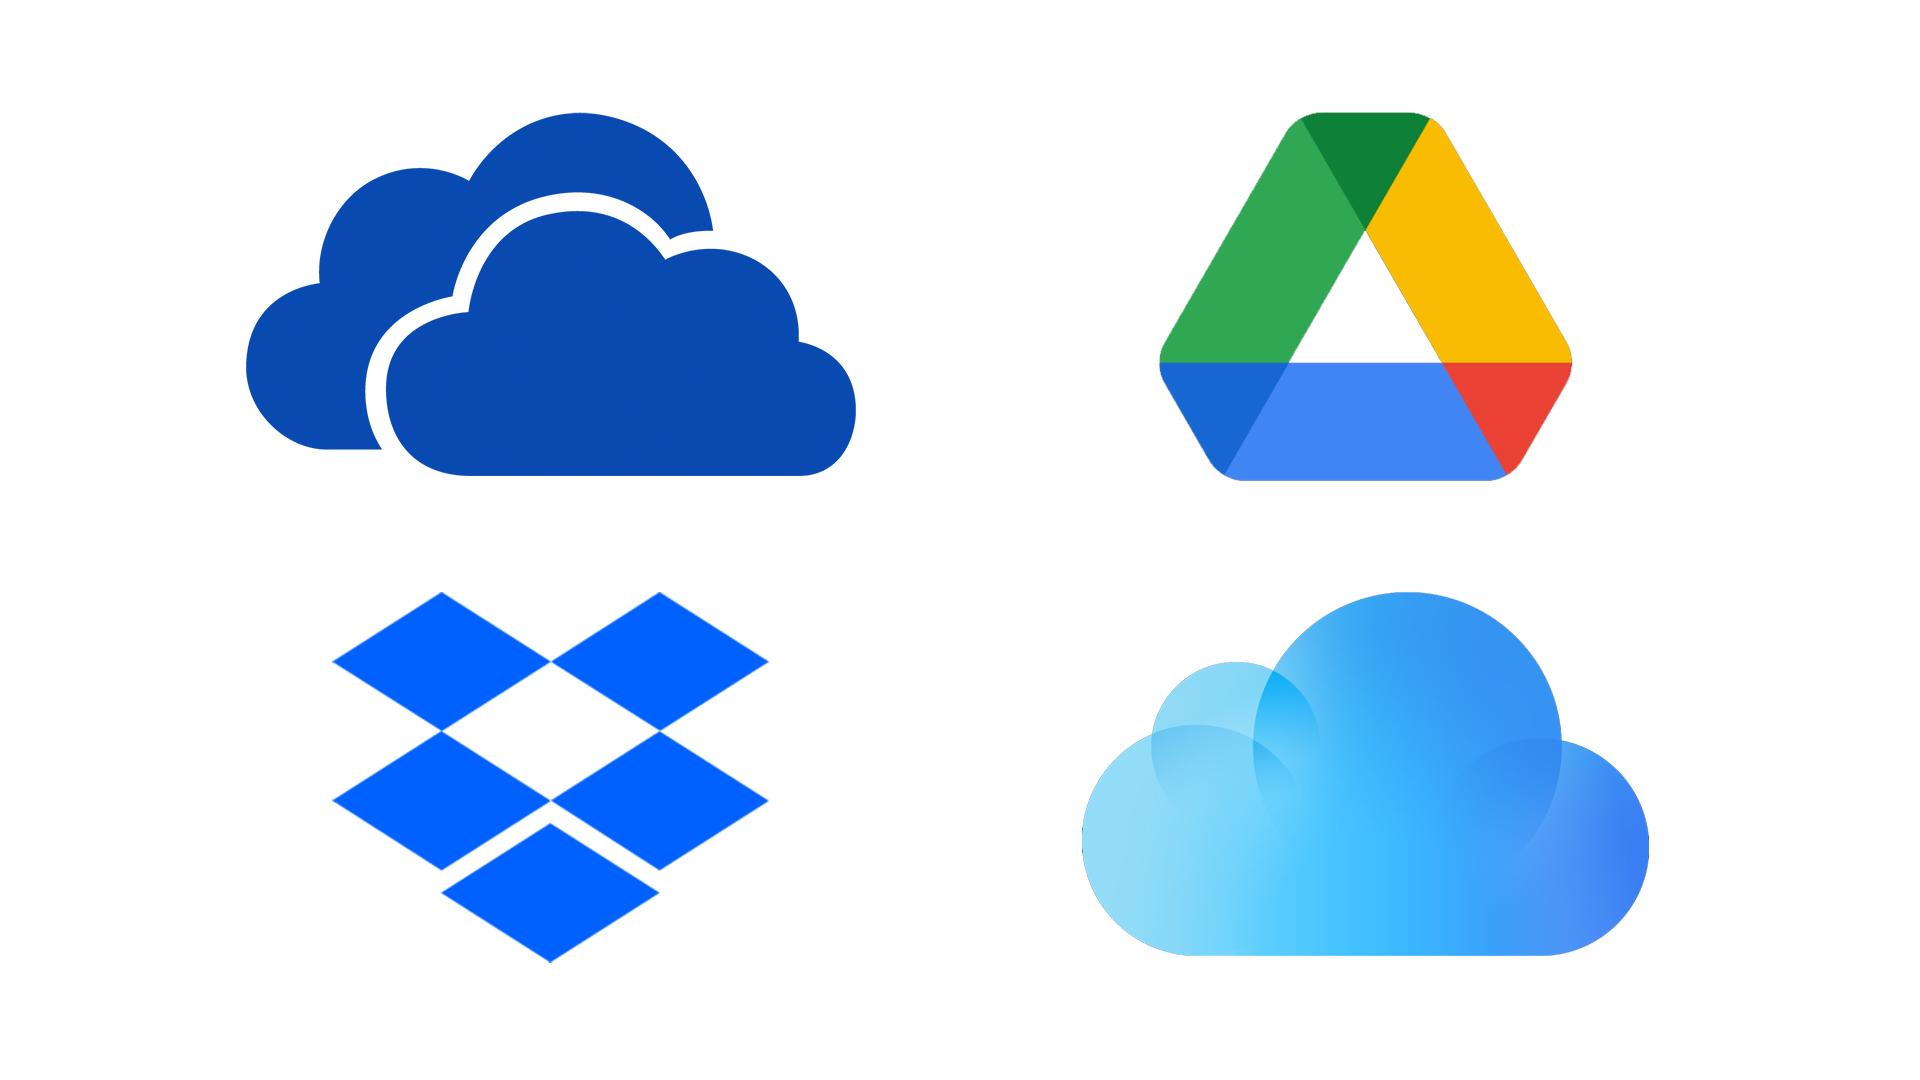 Cómo usar Dropbox, OneDrive, Google Drive o iCloud